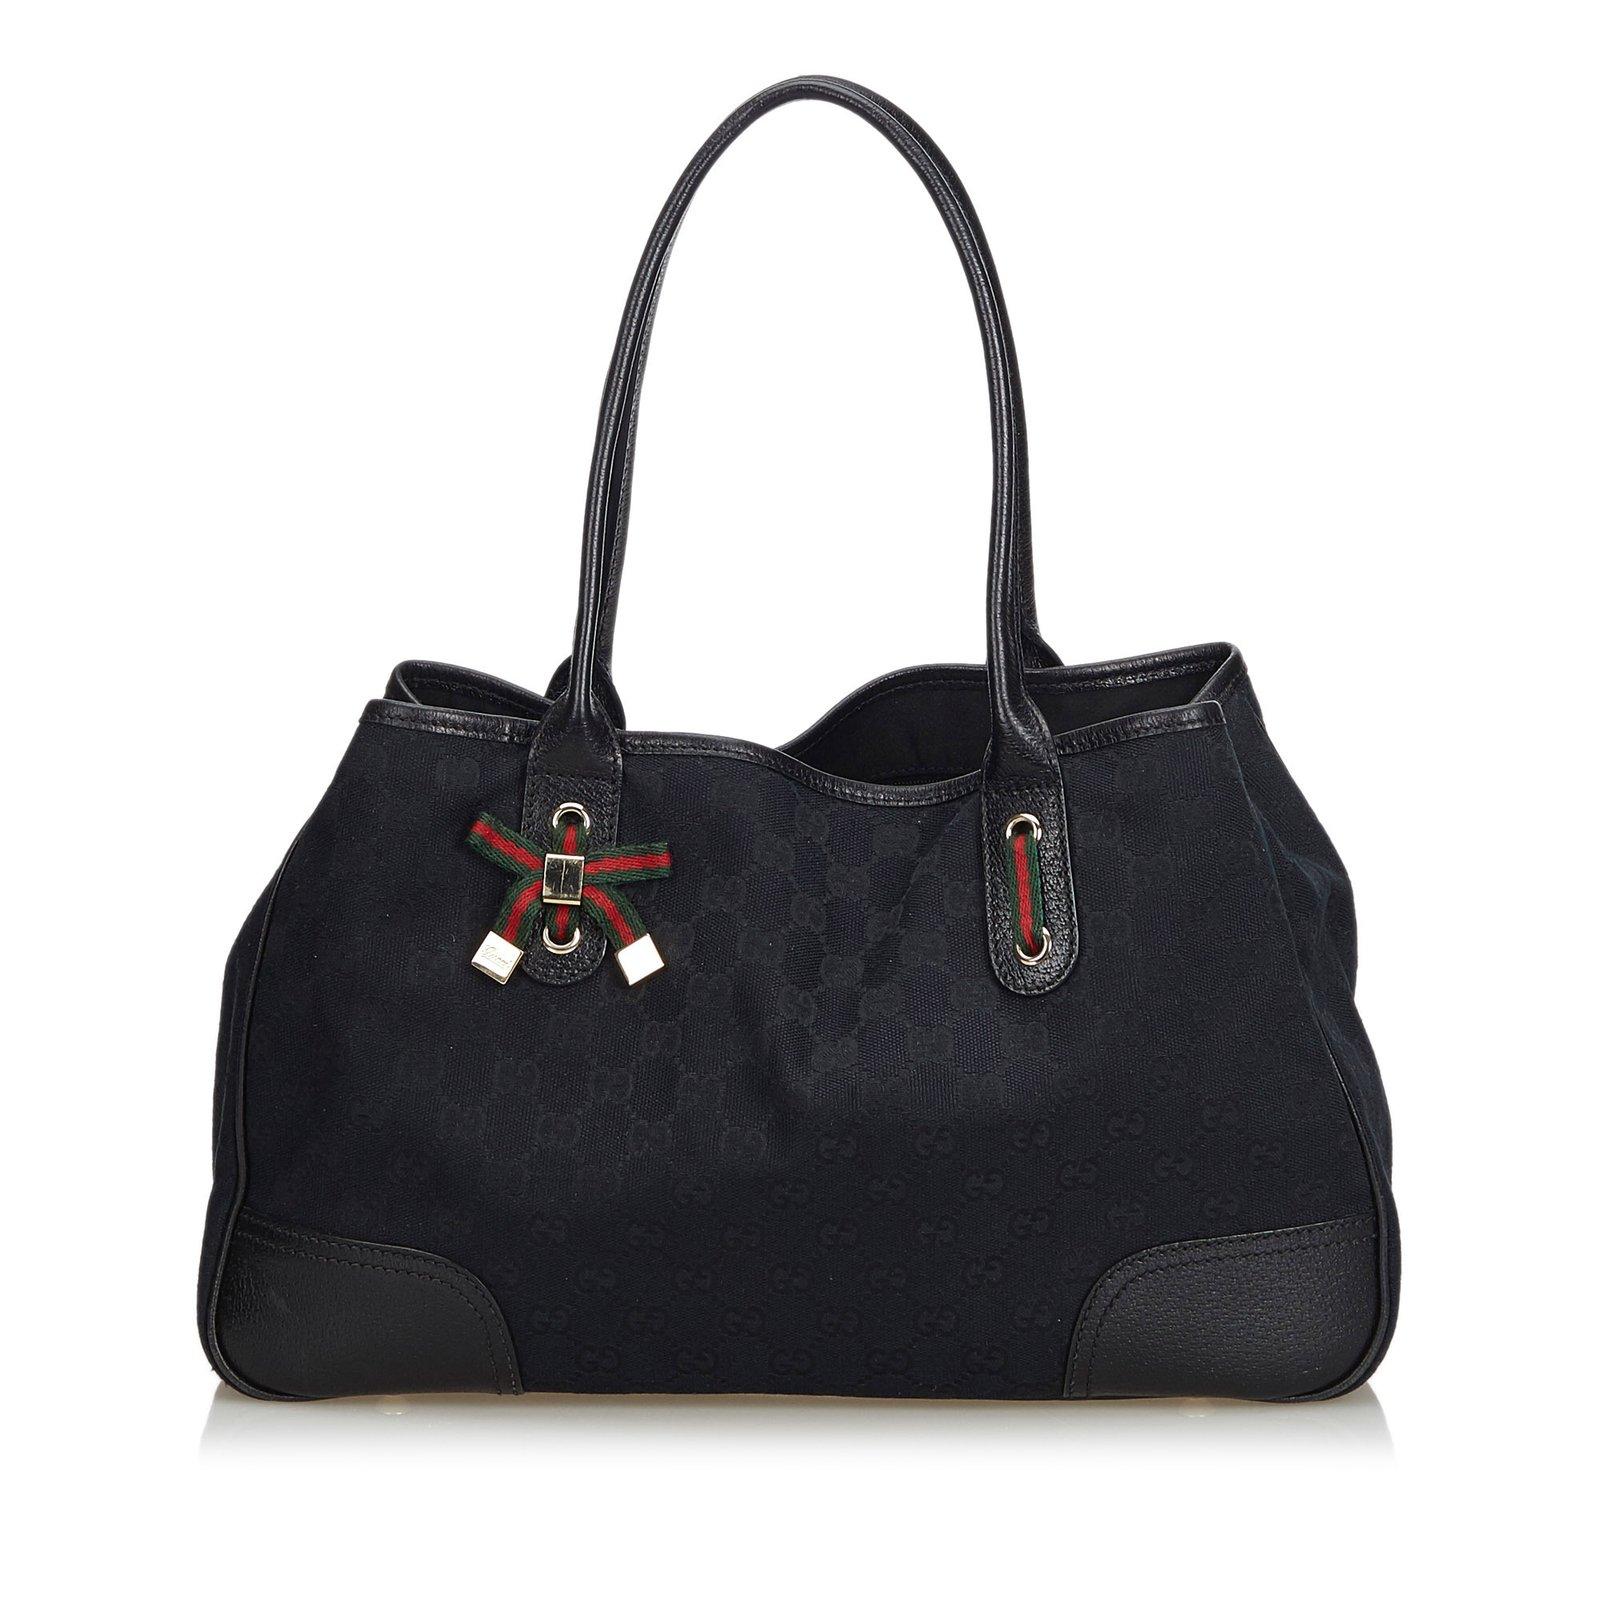 1b6104b2400 Gucci GG Jacquard Princy Tote Bag Totes Leather